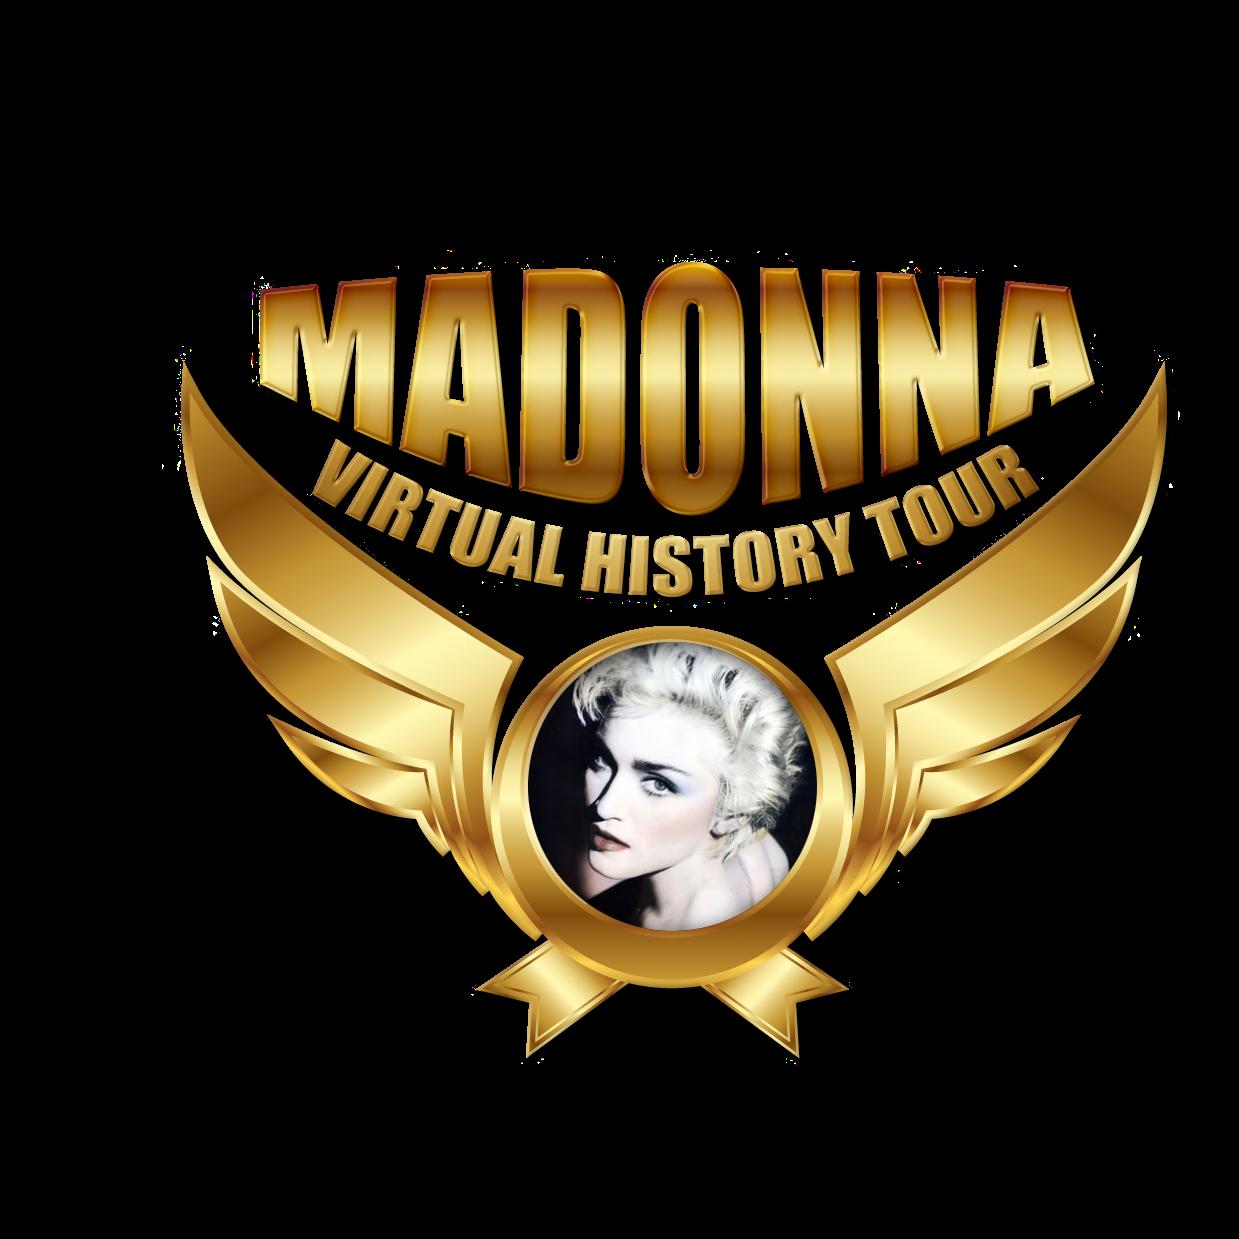 Madonna VHT